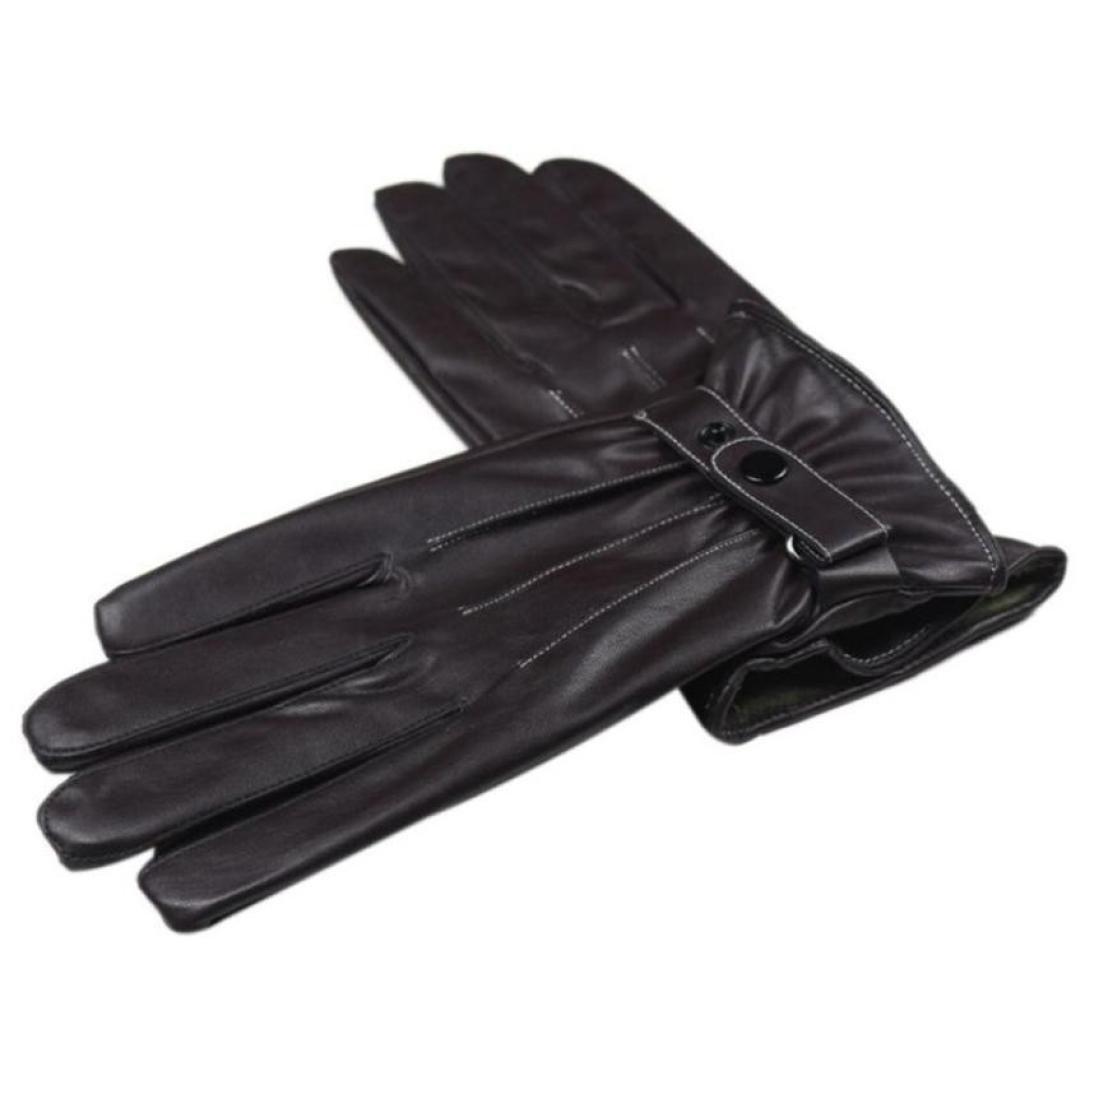 Black Men Gloves Winter Leather Lowprofile Men Leather Winter Gloves Touchscreen Driving Warm Gloves